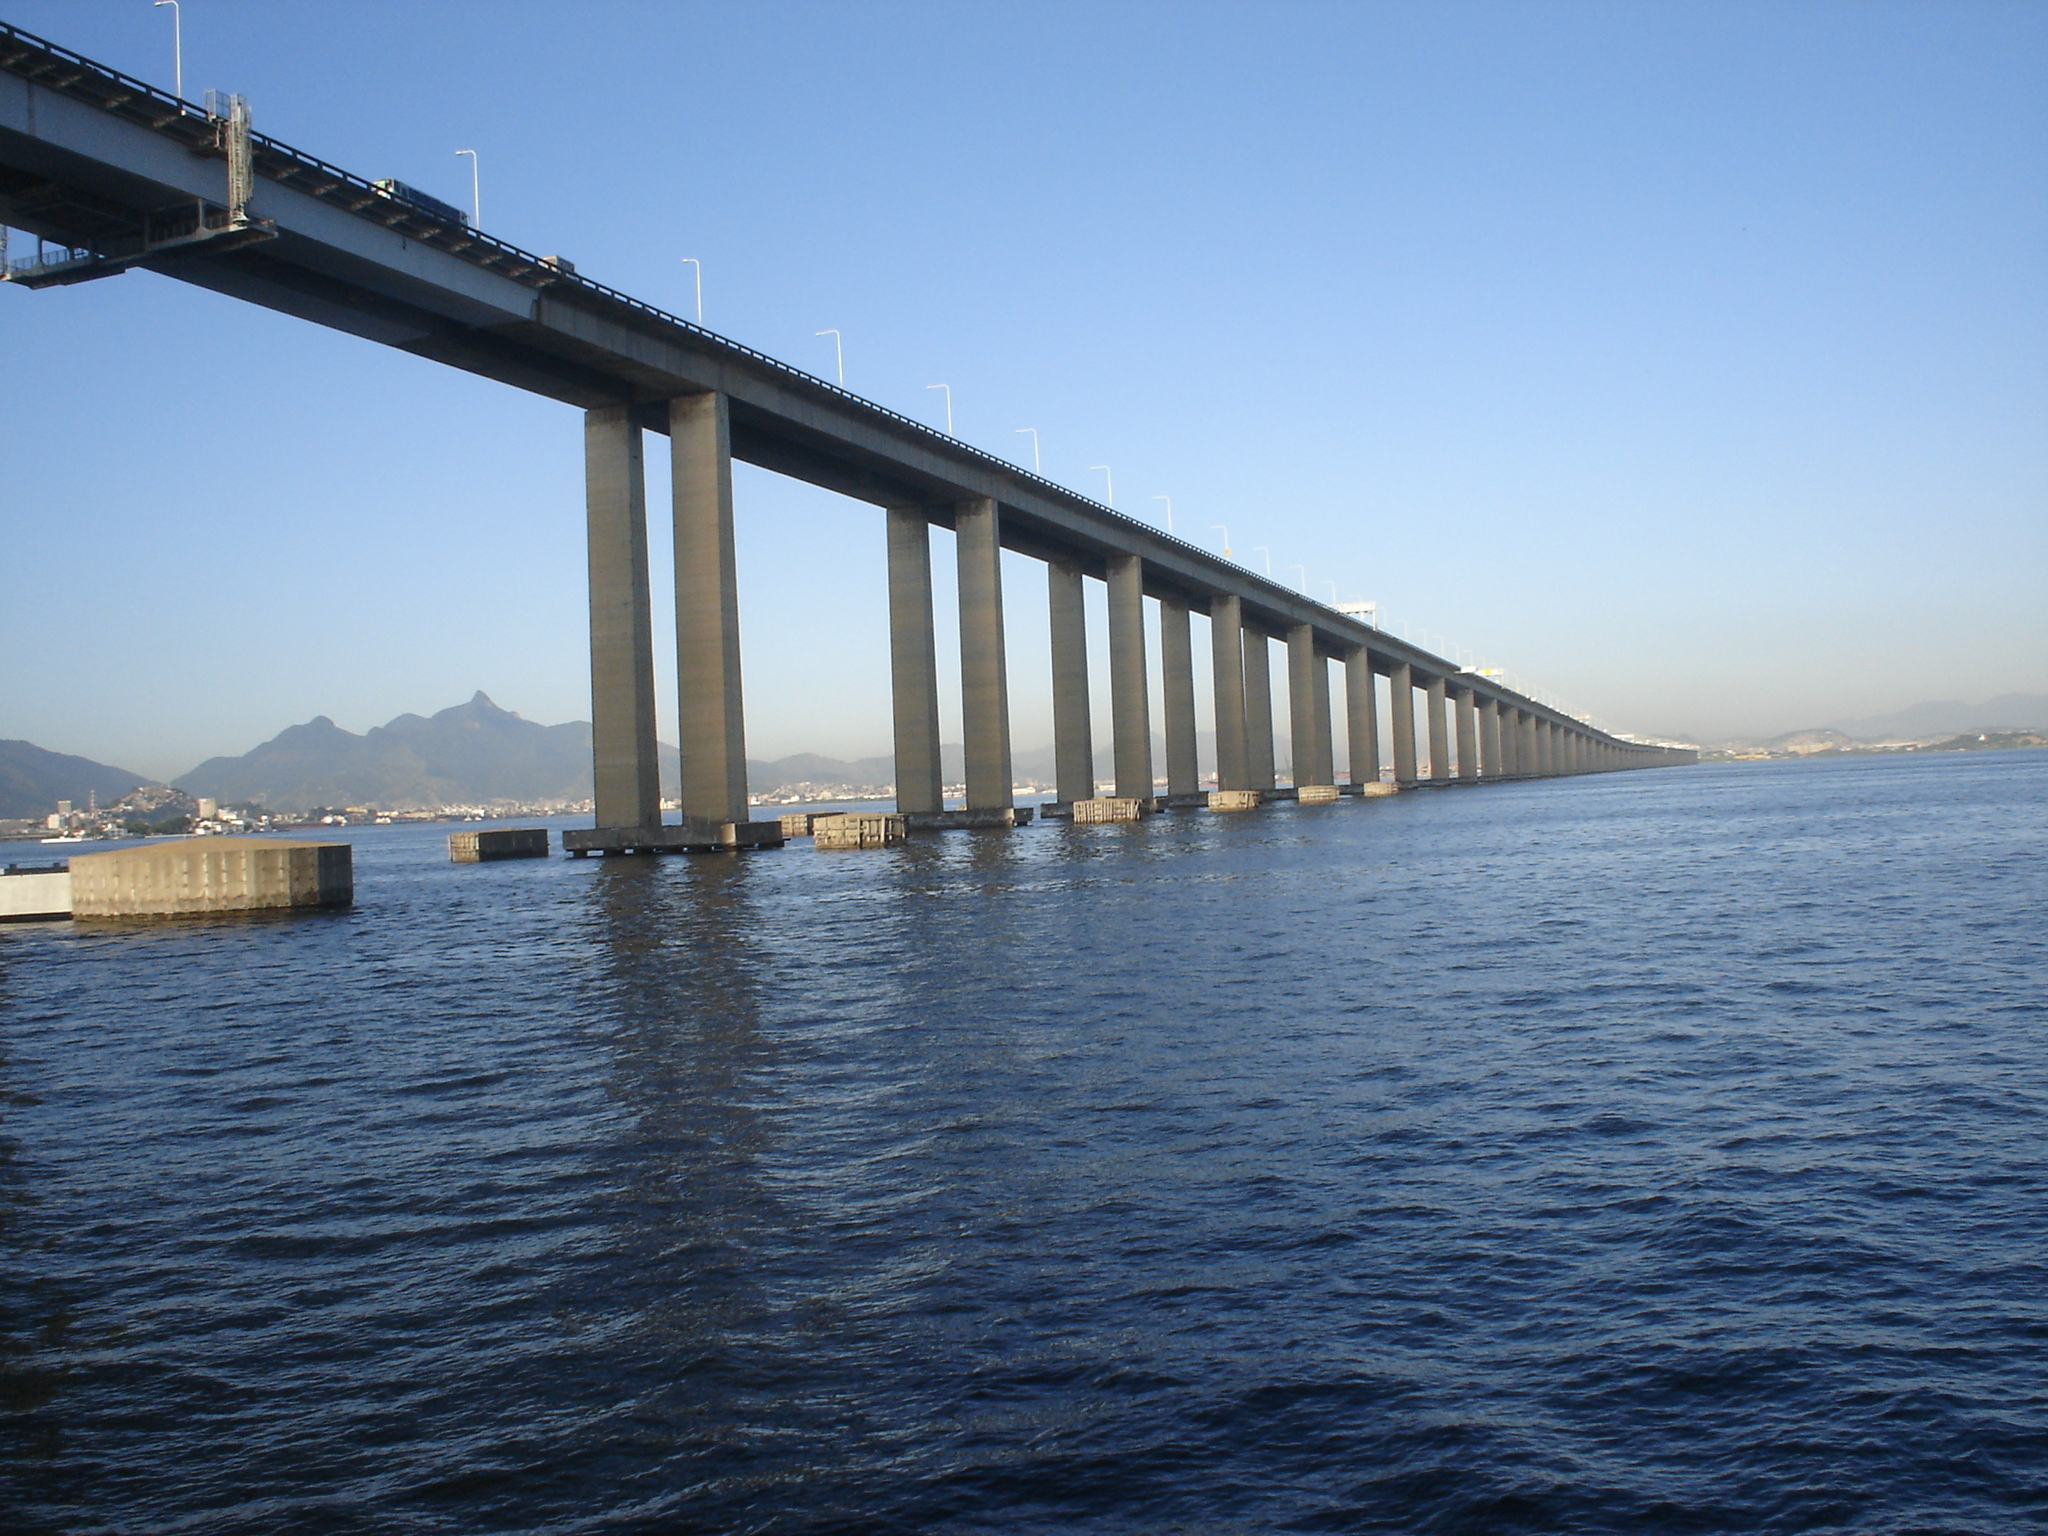 Ponte_rio_niteroi.JPG